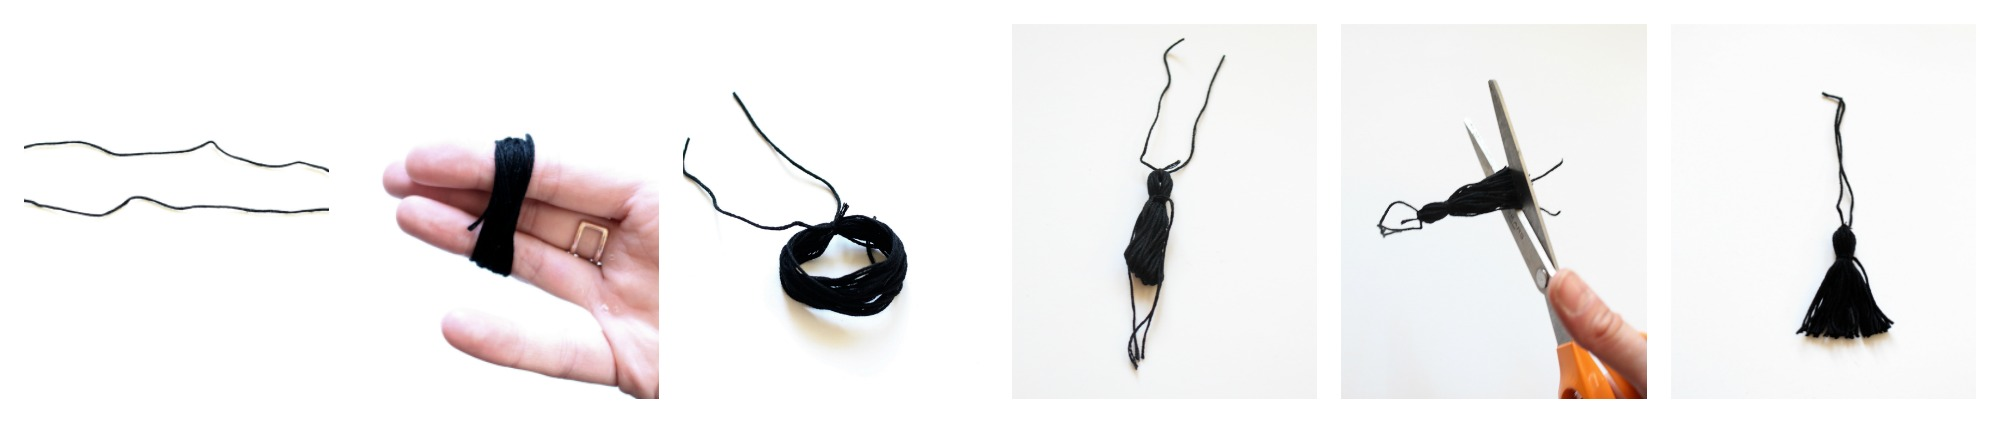 diy-tassel-how-to-make-a-tassel-step-by-step-instructions-to-make-a-tassel-diy-crafts-tassel-project